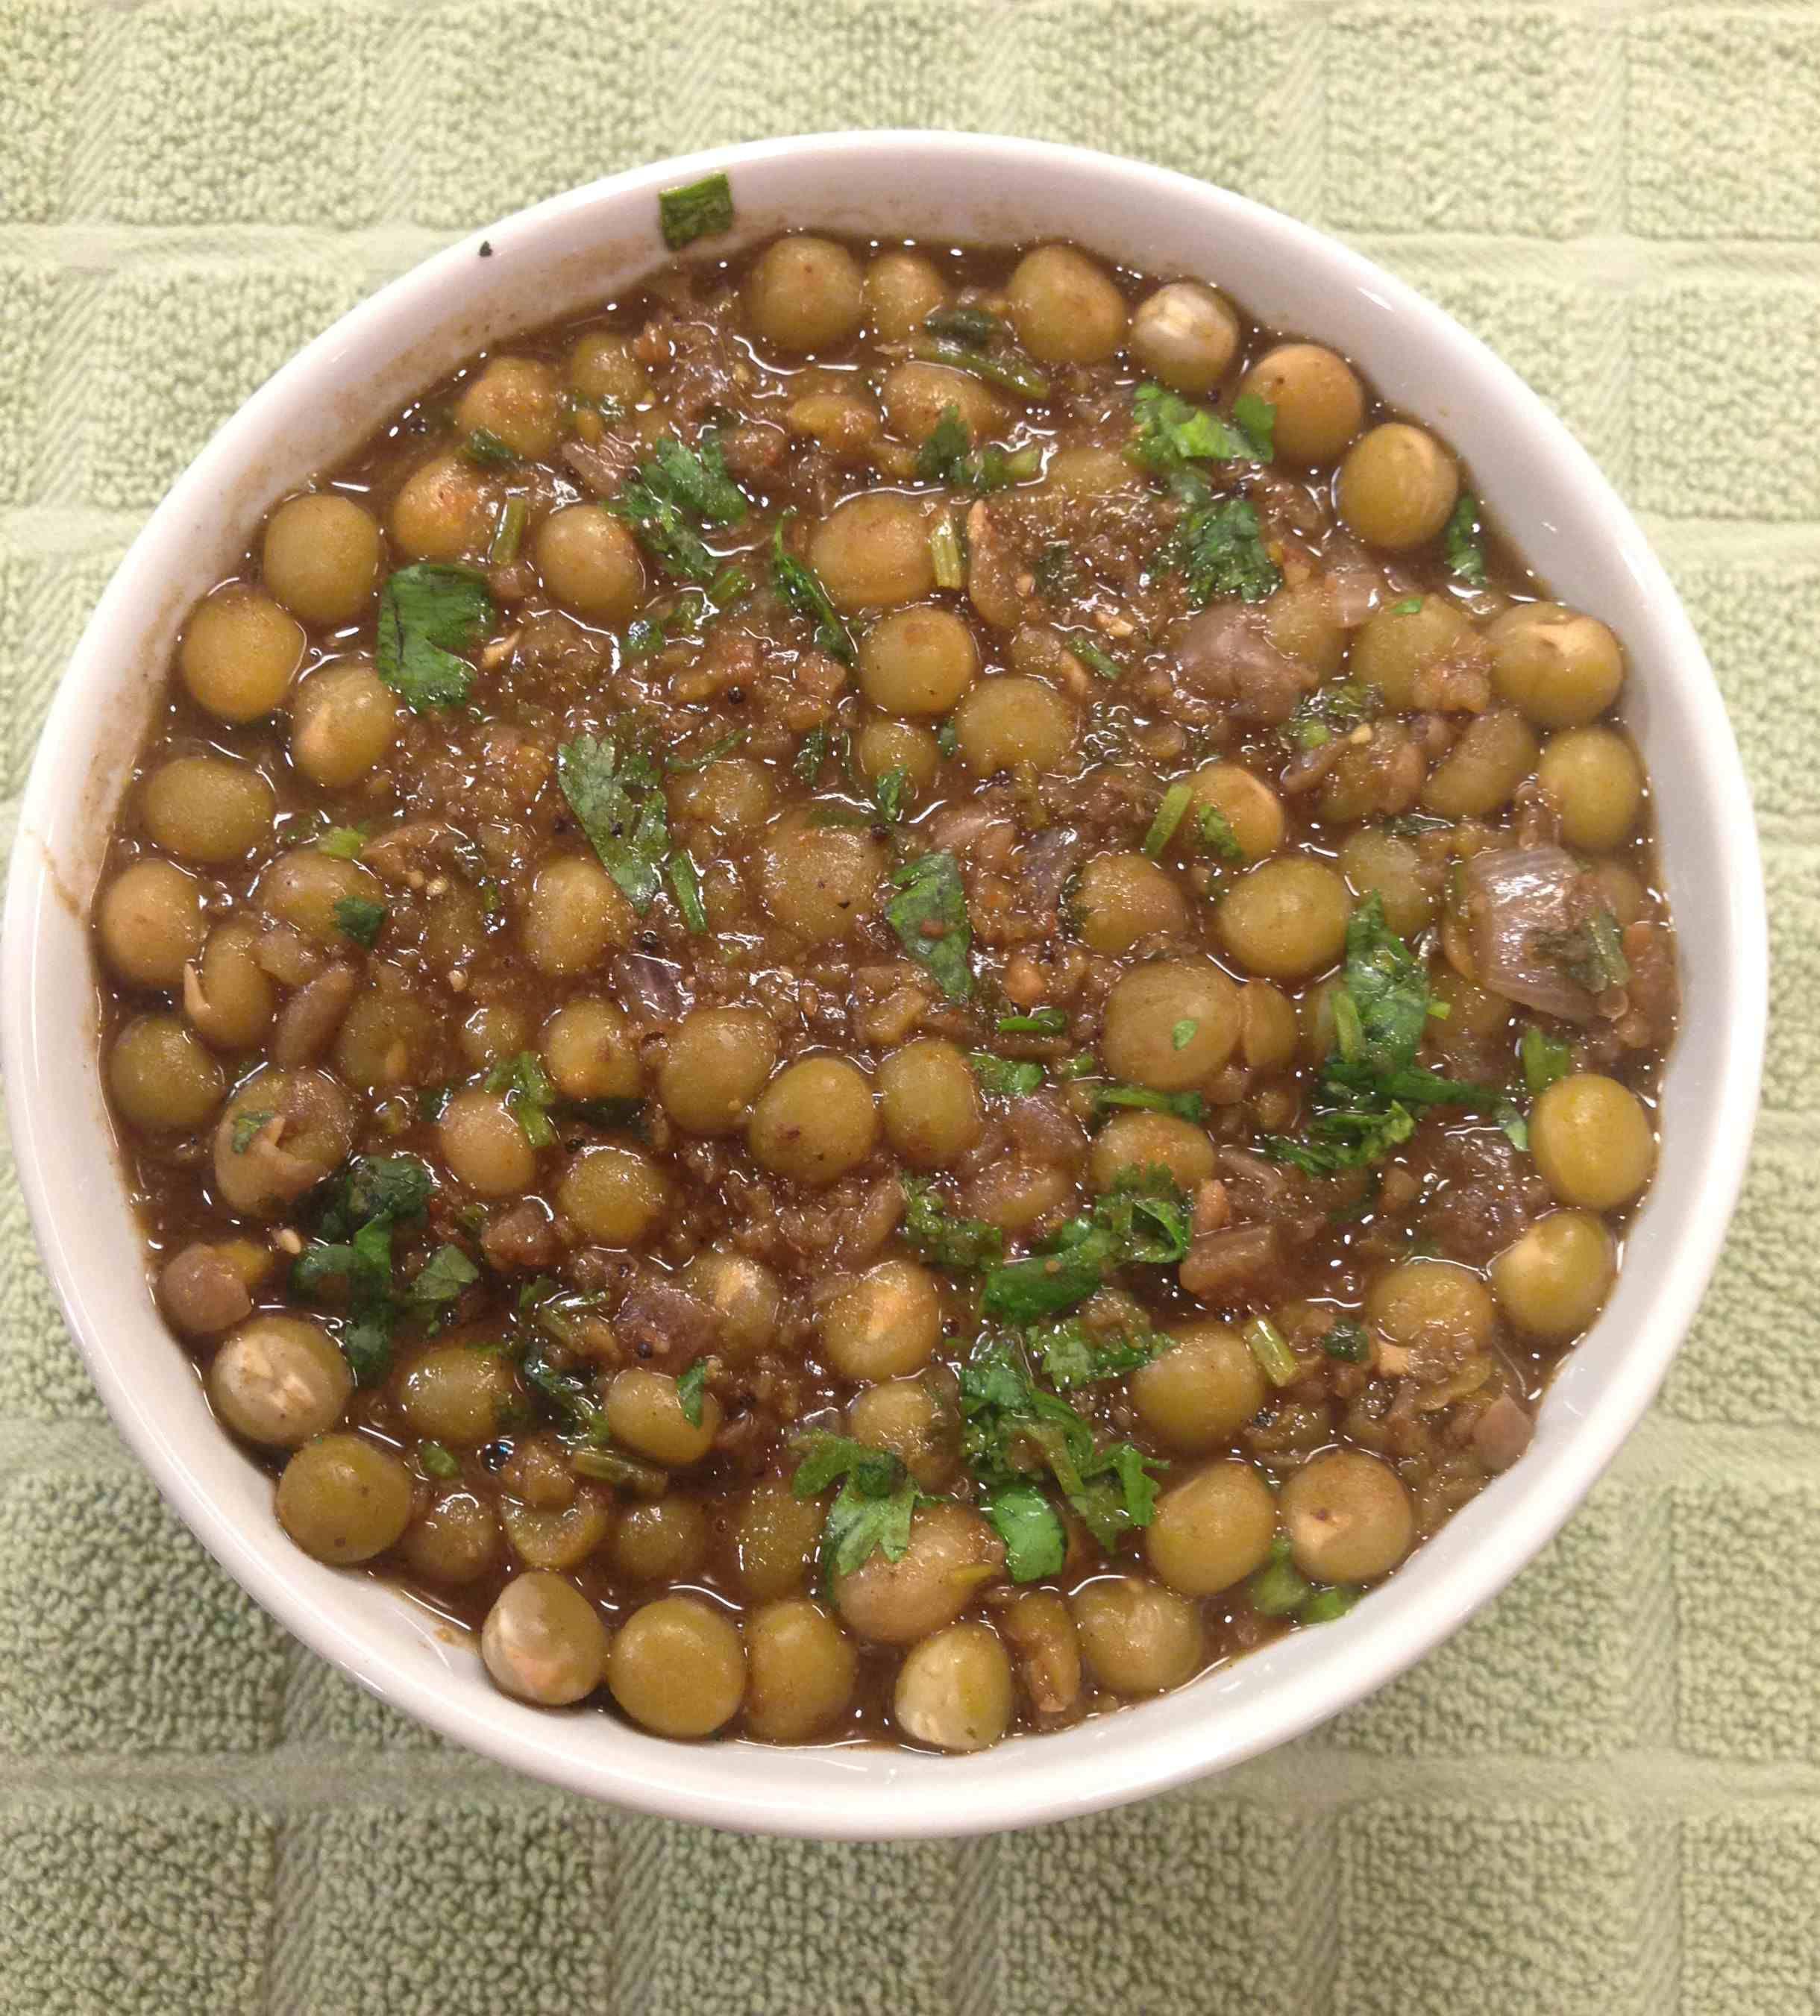 Malvani Vatana Masala (Dried Green Peas Curry) The